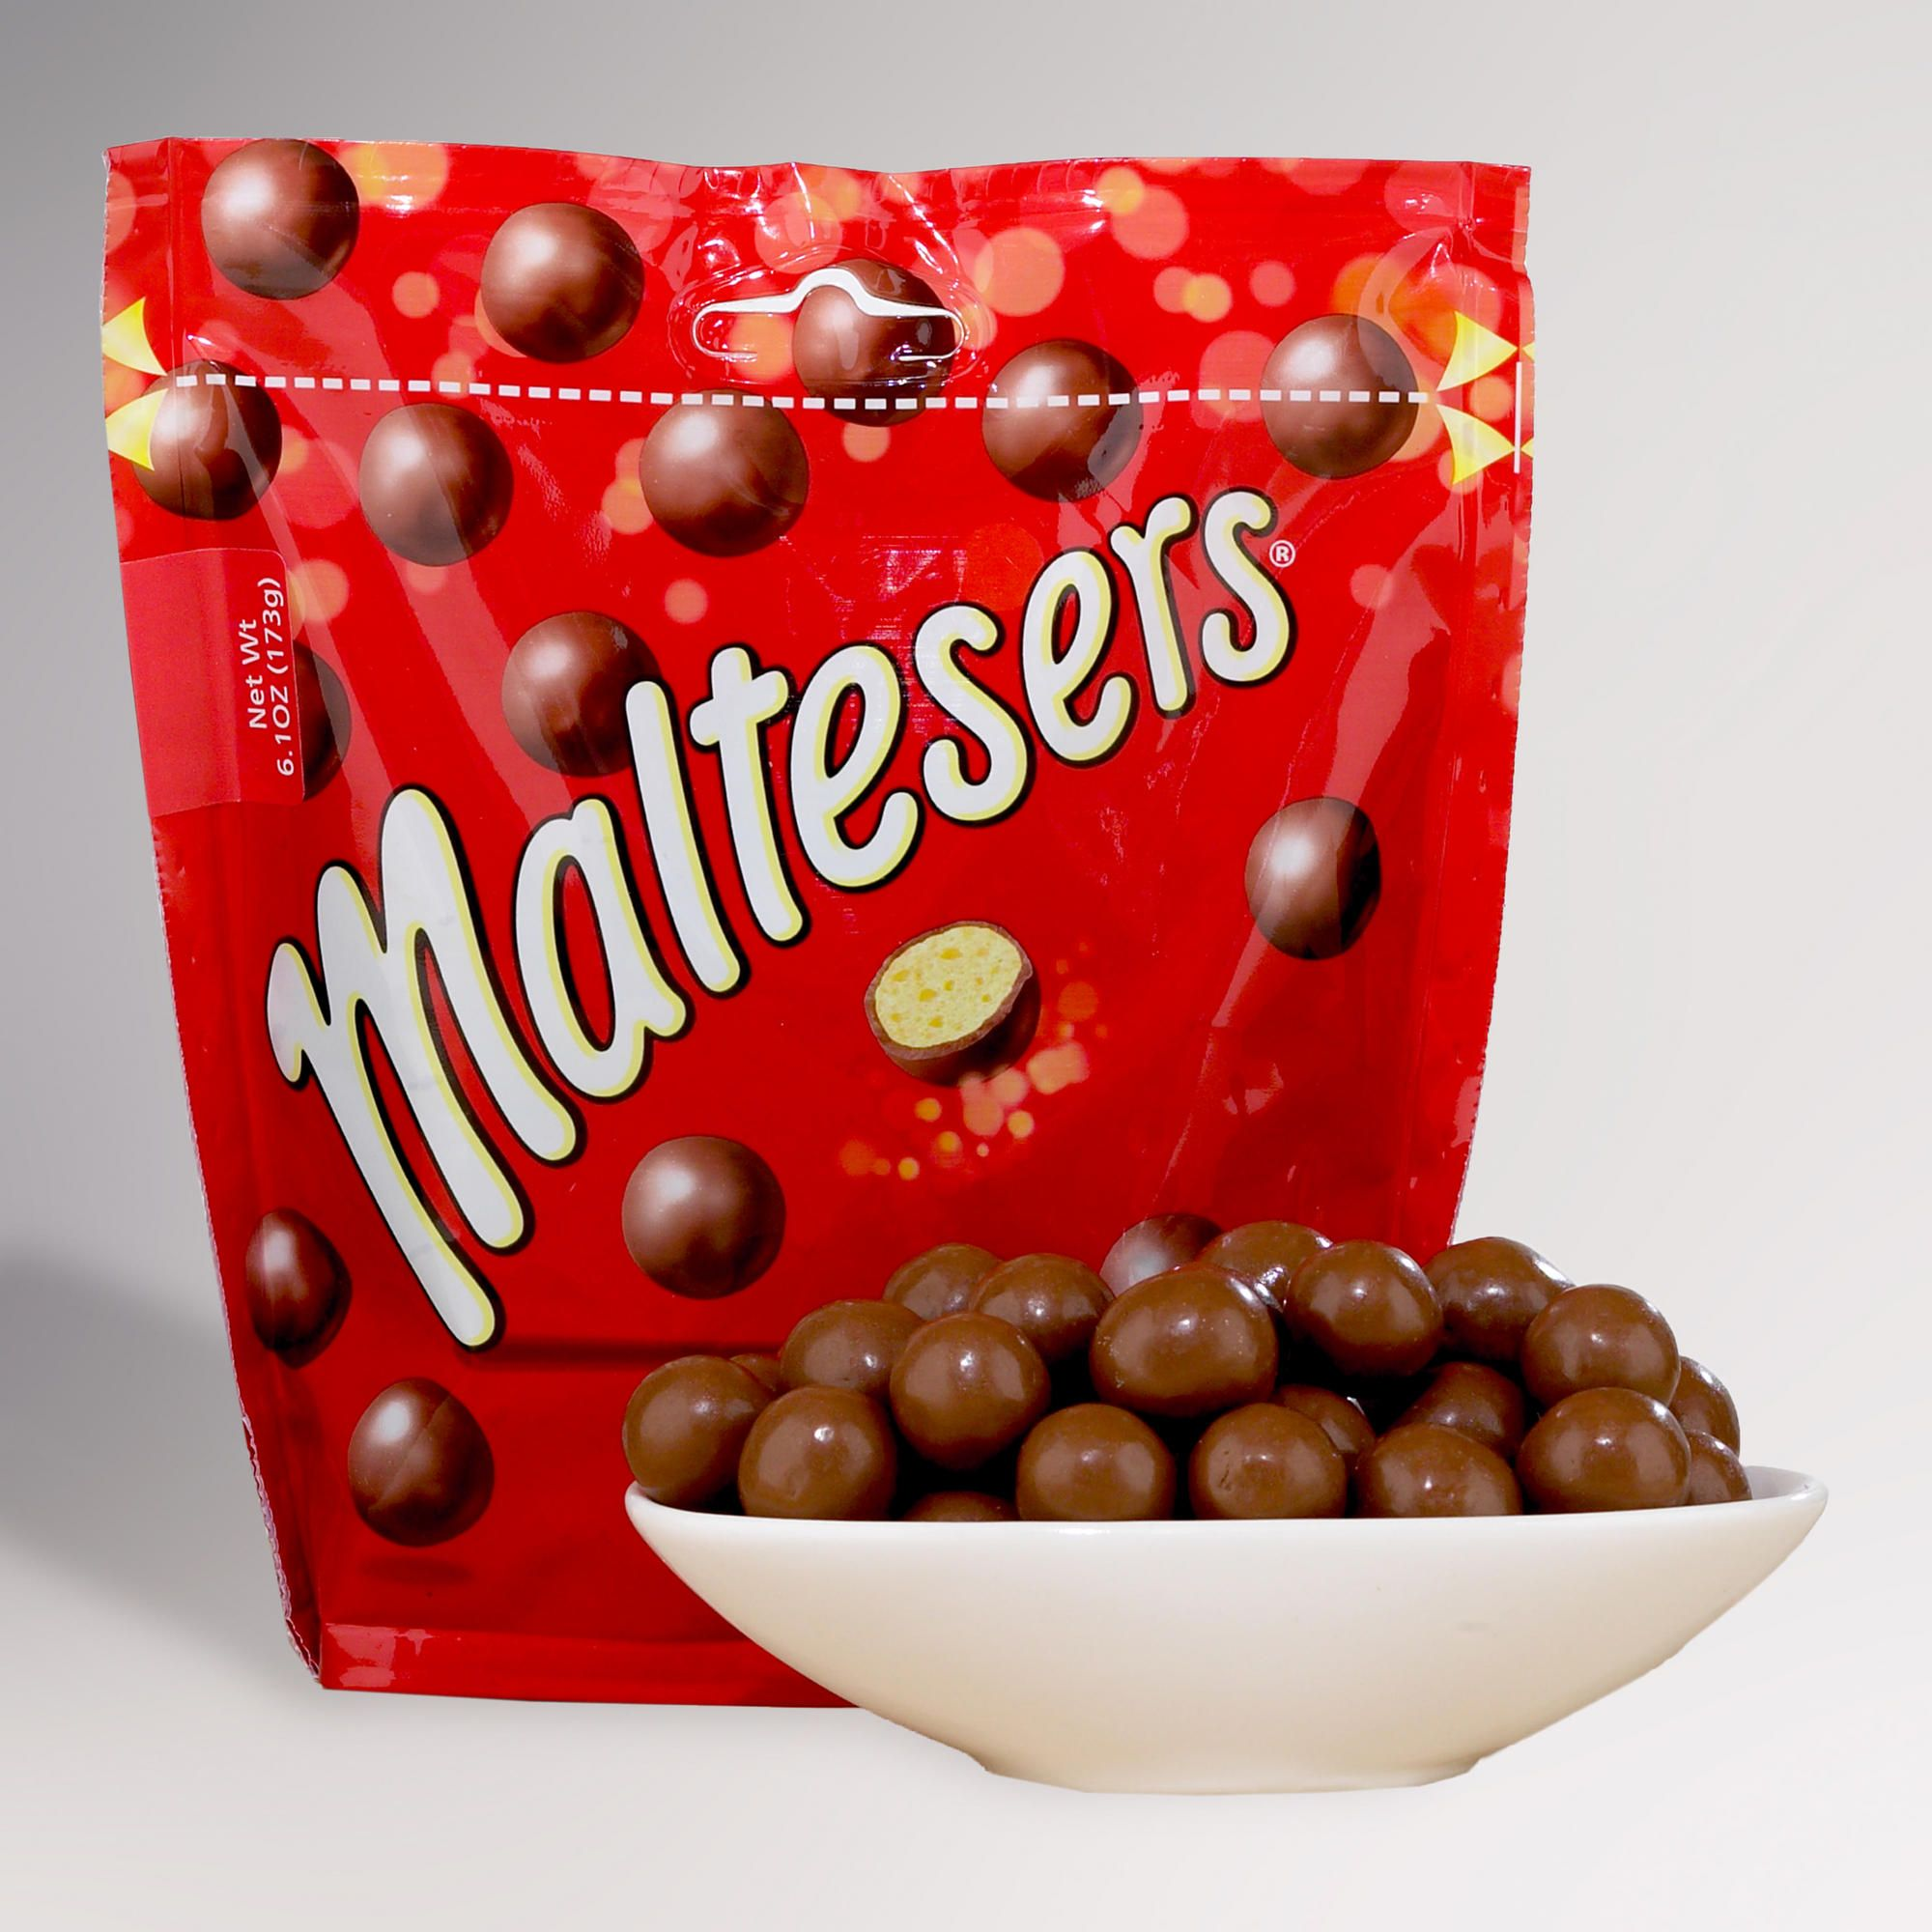 Maltesers Maltesers Traditional English Food Gourmet Chocolate